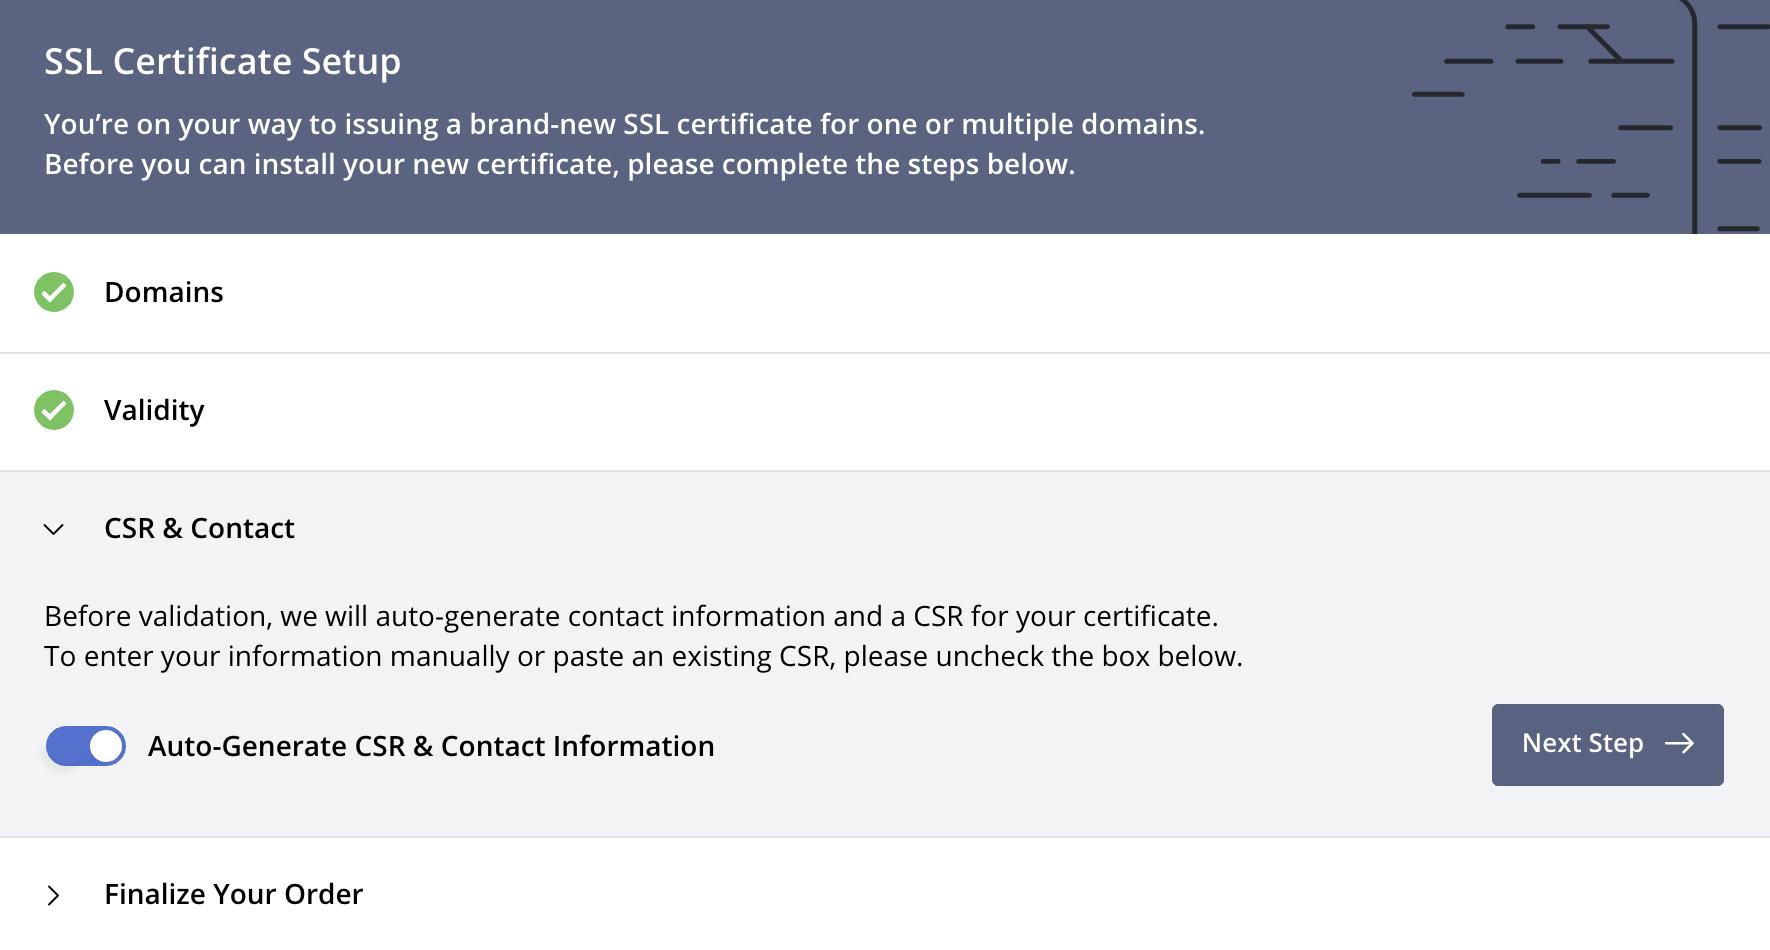 Create Certificate: CSR & Contact